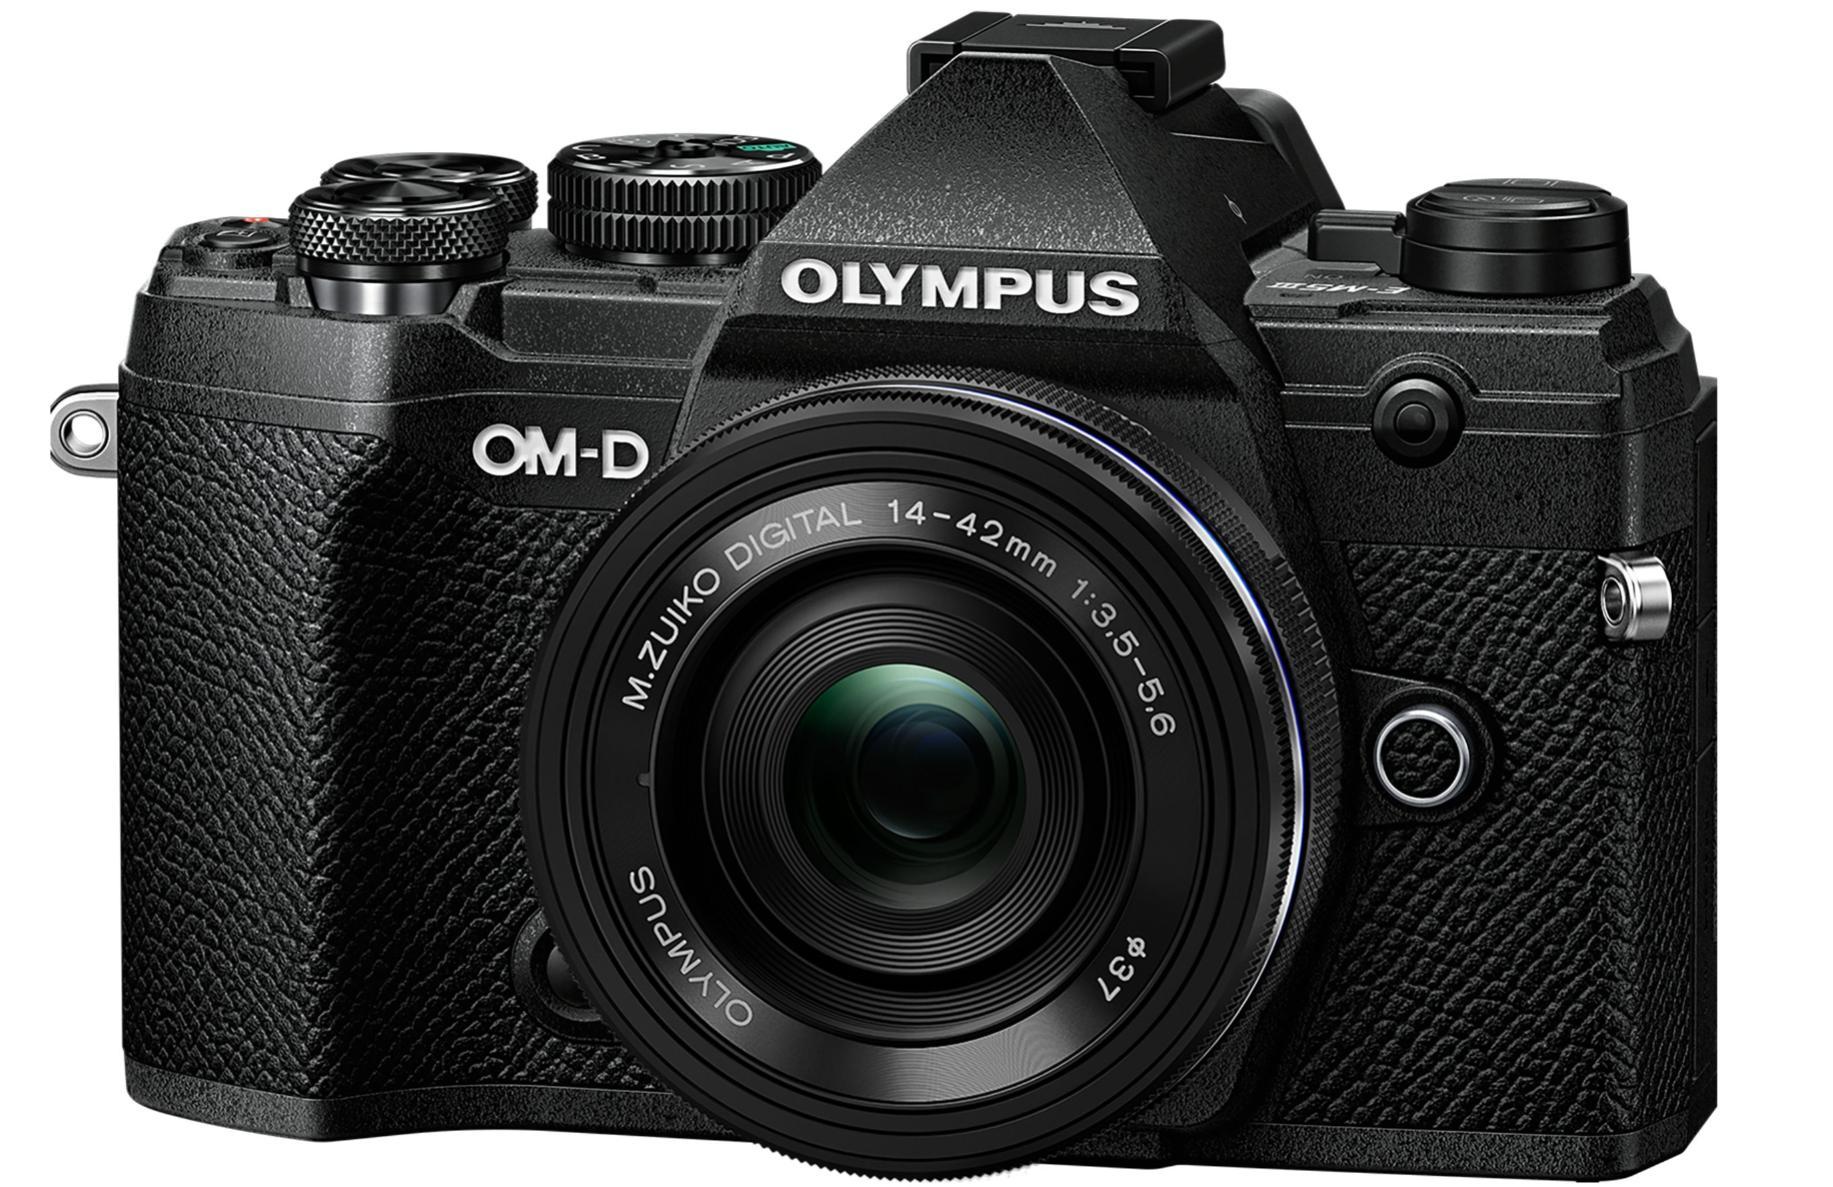 Kit appareil photo hybride Olympus E-M5 MARK III + objectif zoom 14-42mm EZ - Monture micro 4/3, 20.4 MP (Via ODR de 150€)